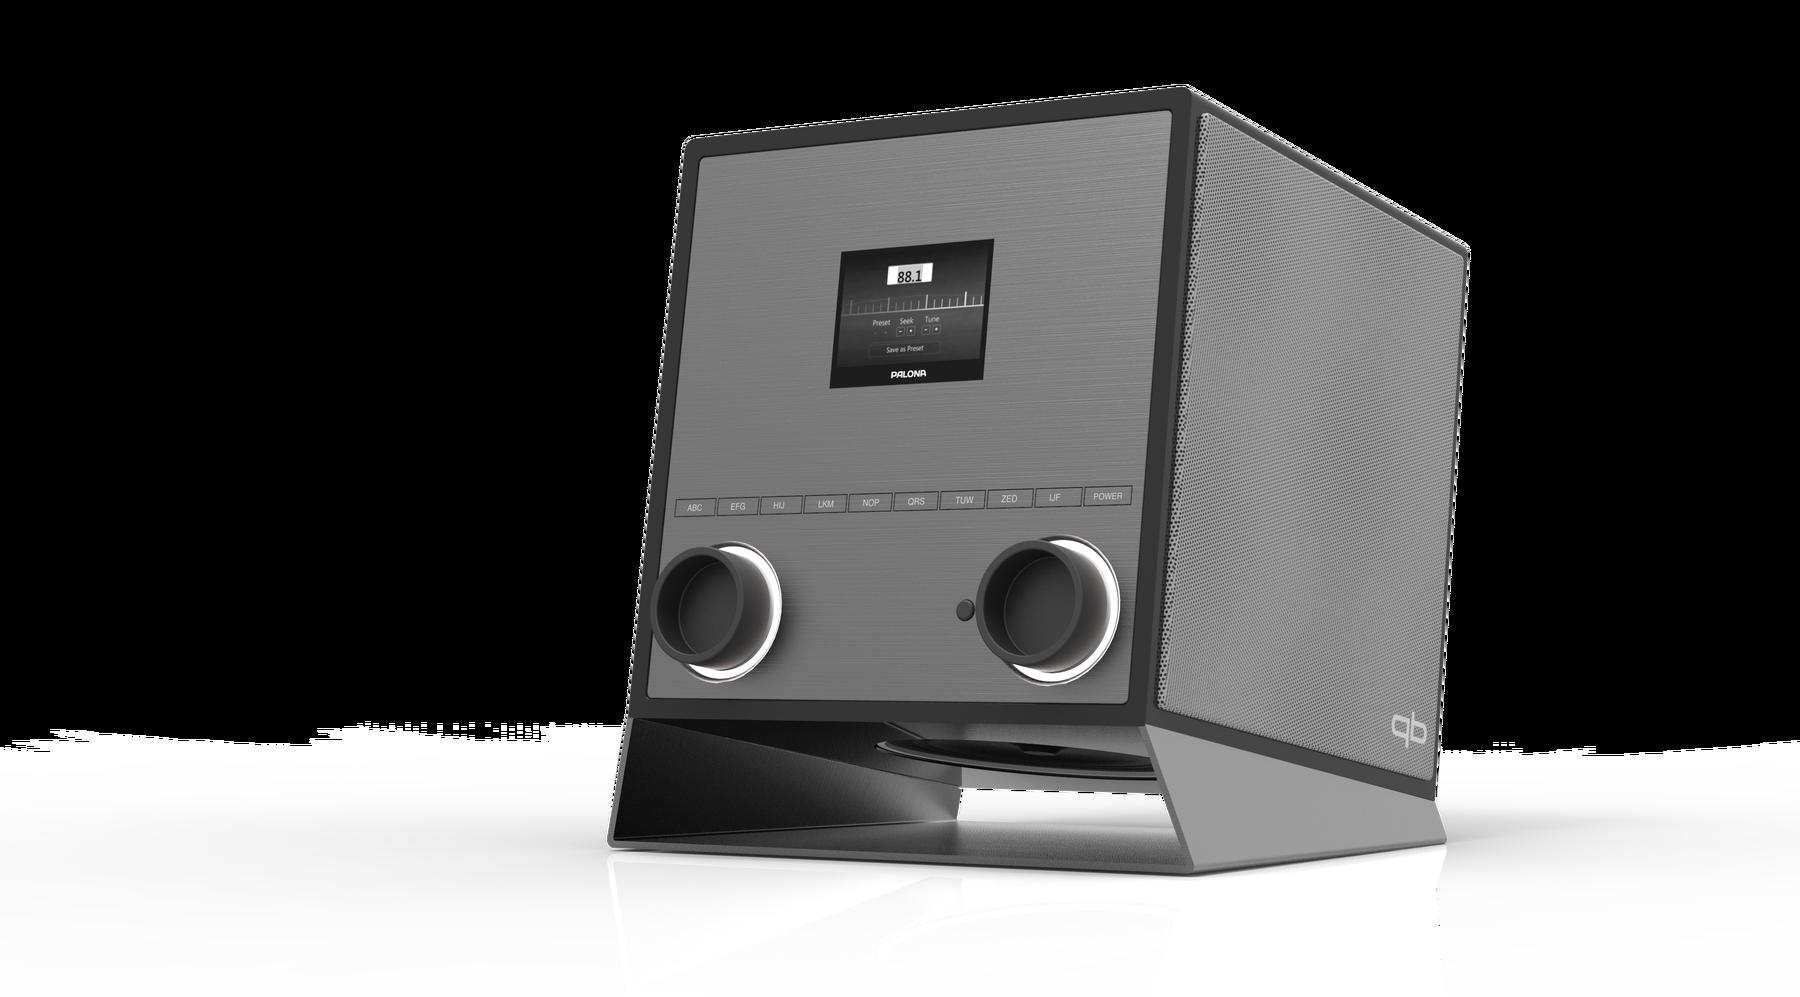 Palona Quubi, Schwarz Hochglanz-Silber, 2.1 Soundsystem mit Subwoofer, 60 Watt